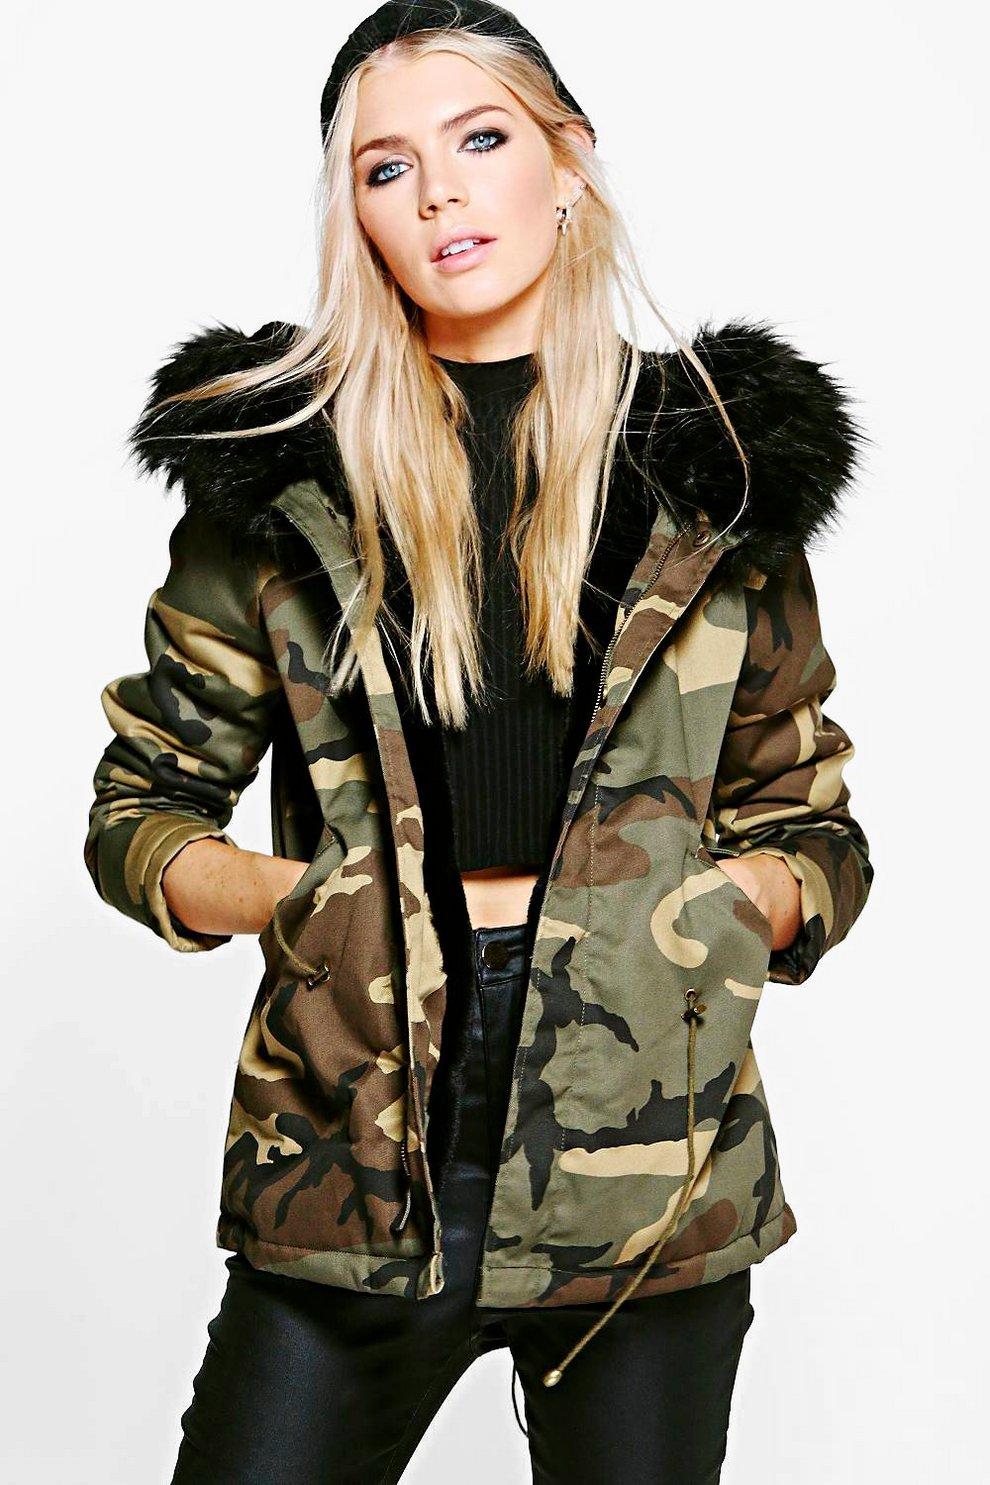 finest selection 4a6e4 0ecf1 Jessica Kurzer Parka mit Camouflage-Print und ...